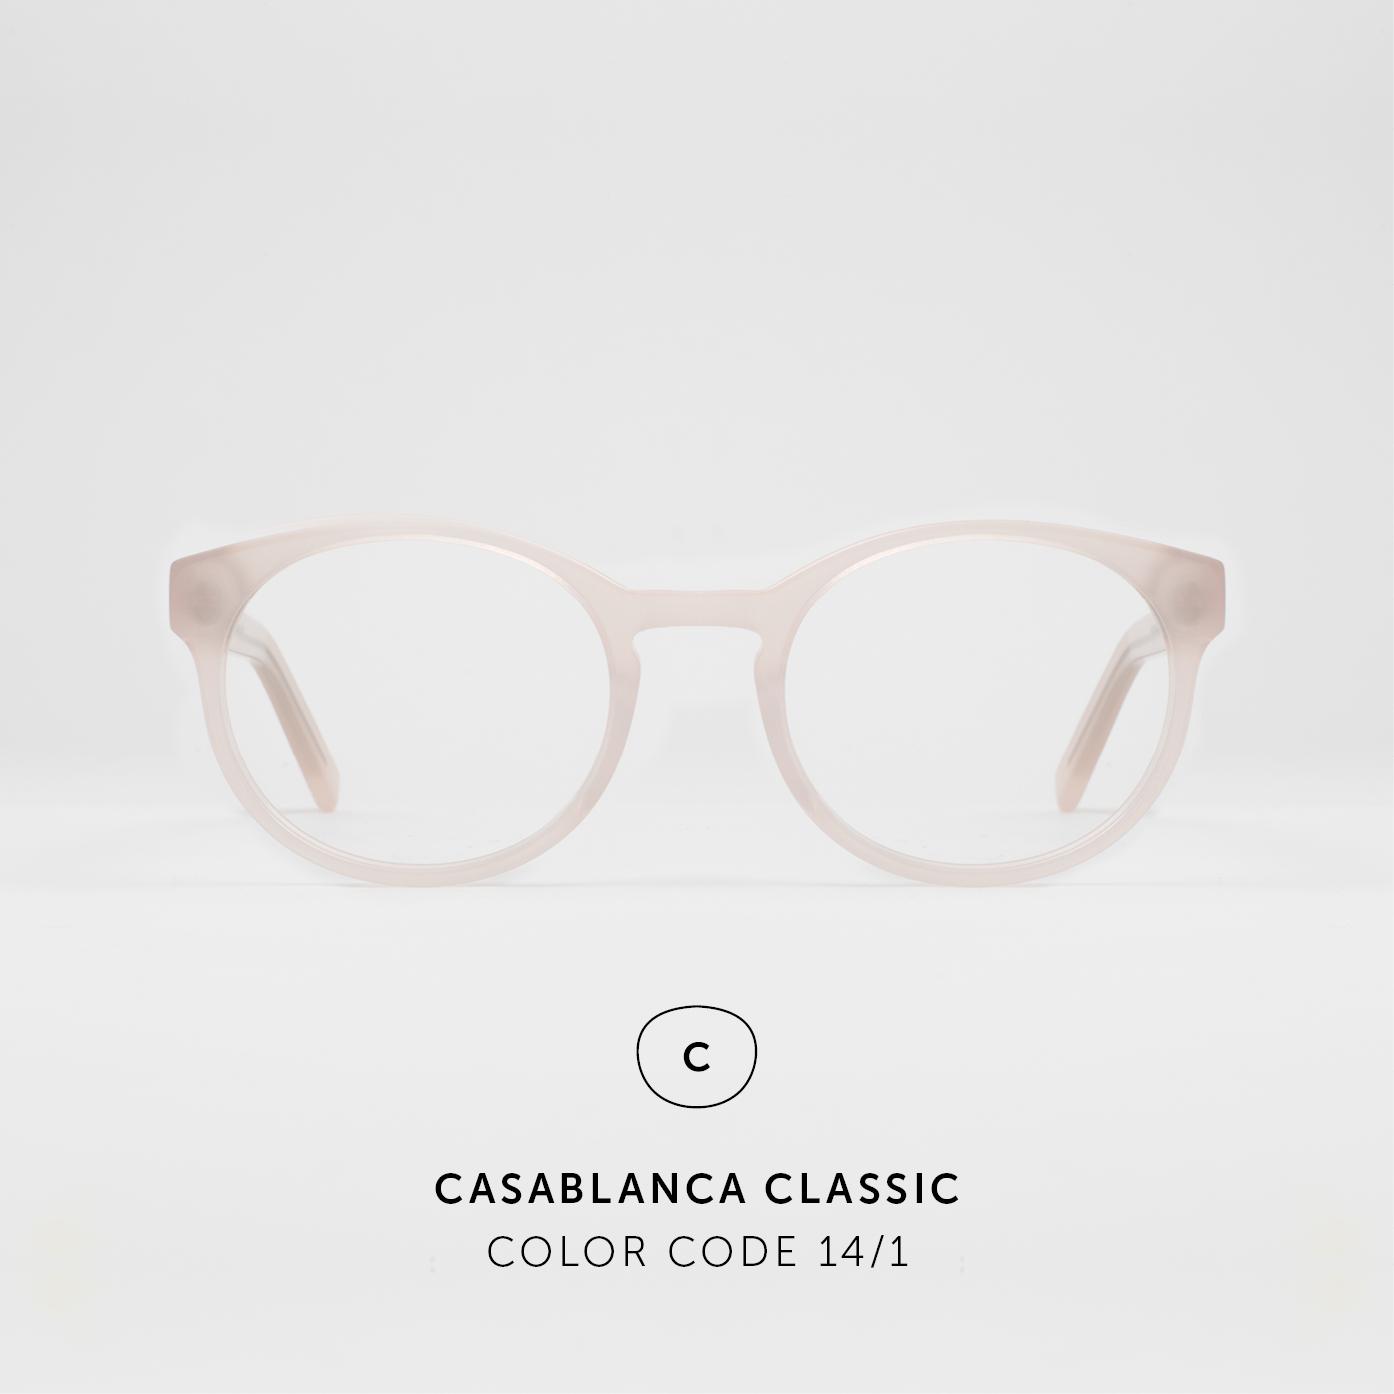 CasablancaClassic61.jpg